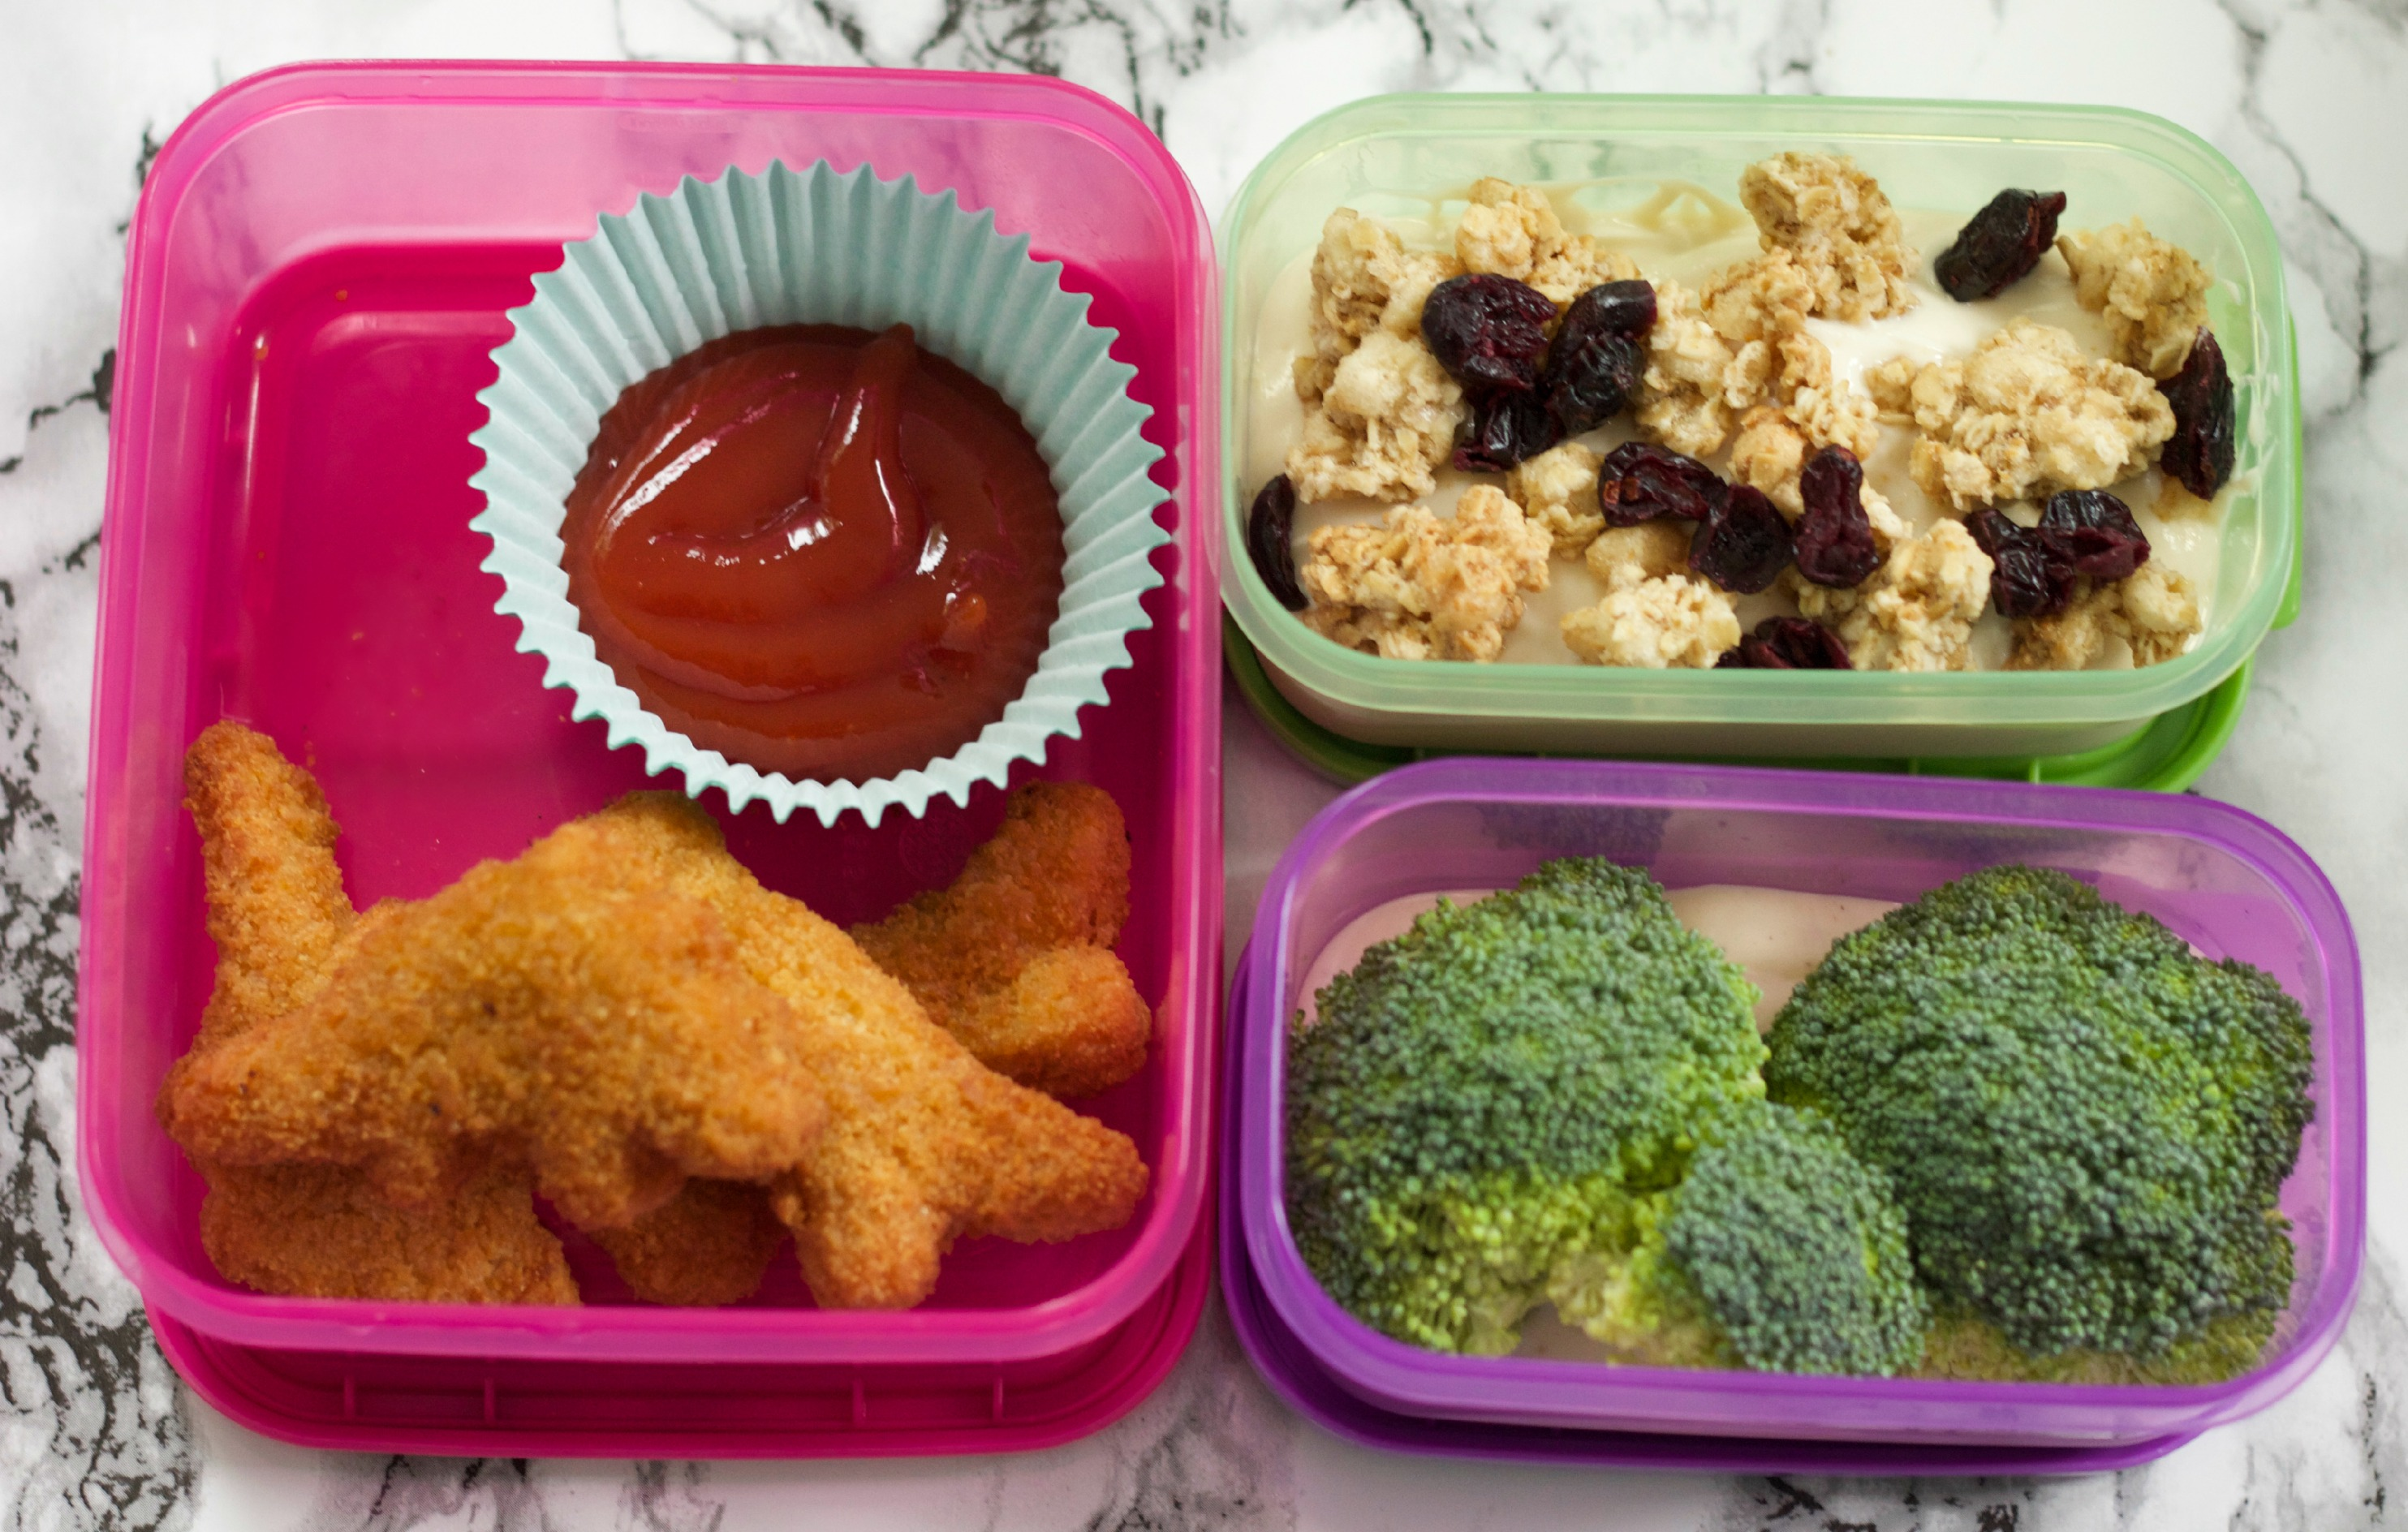 Dinosaur Chicken Nuggets, Broccoli Trees and Yogurt Parfait